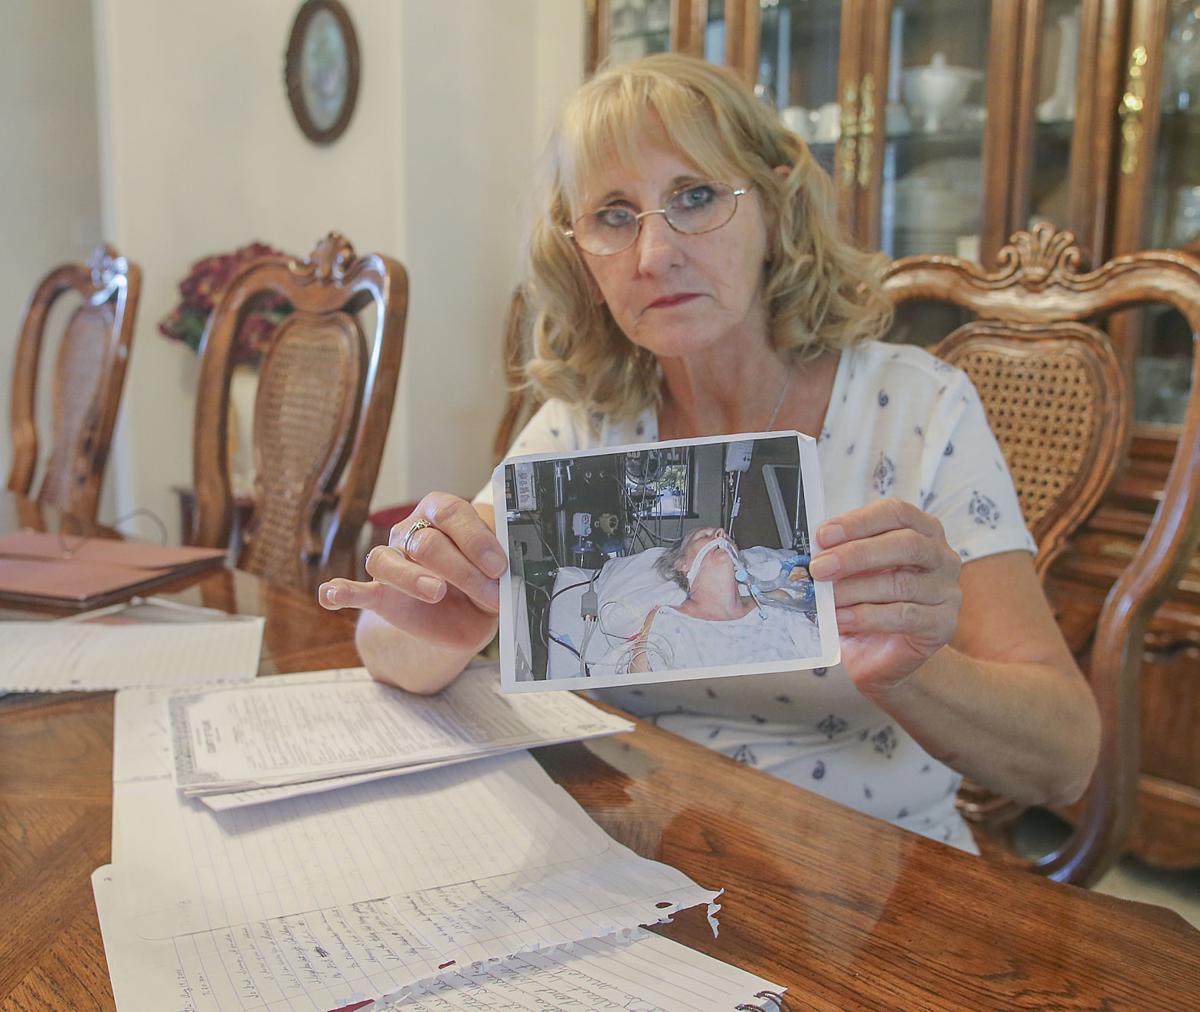 Edie Preller Journaled Her Battle With Valley Fever